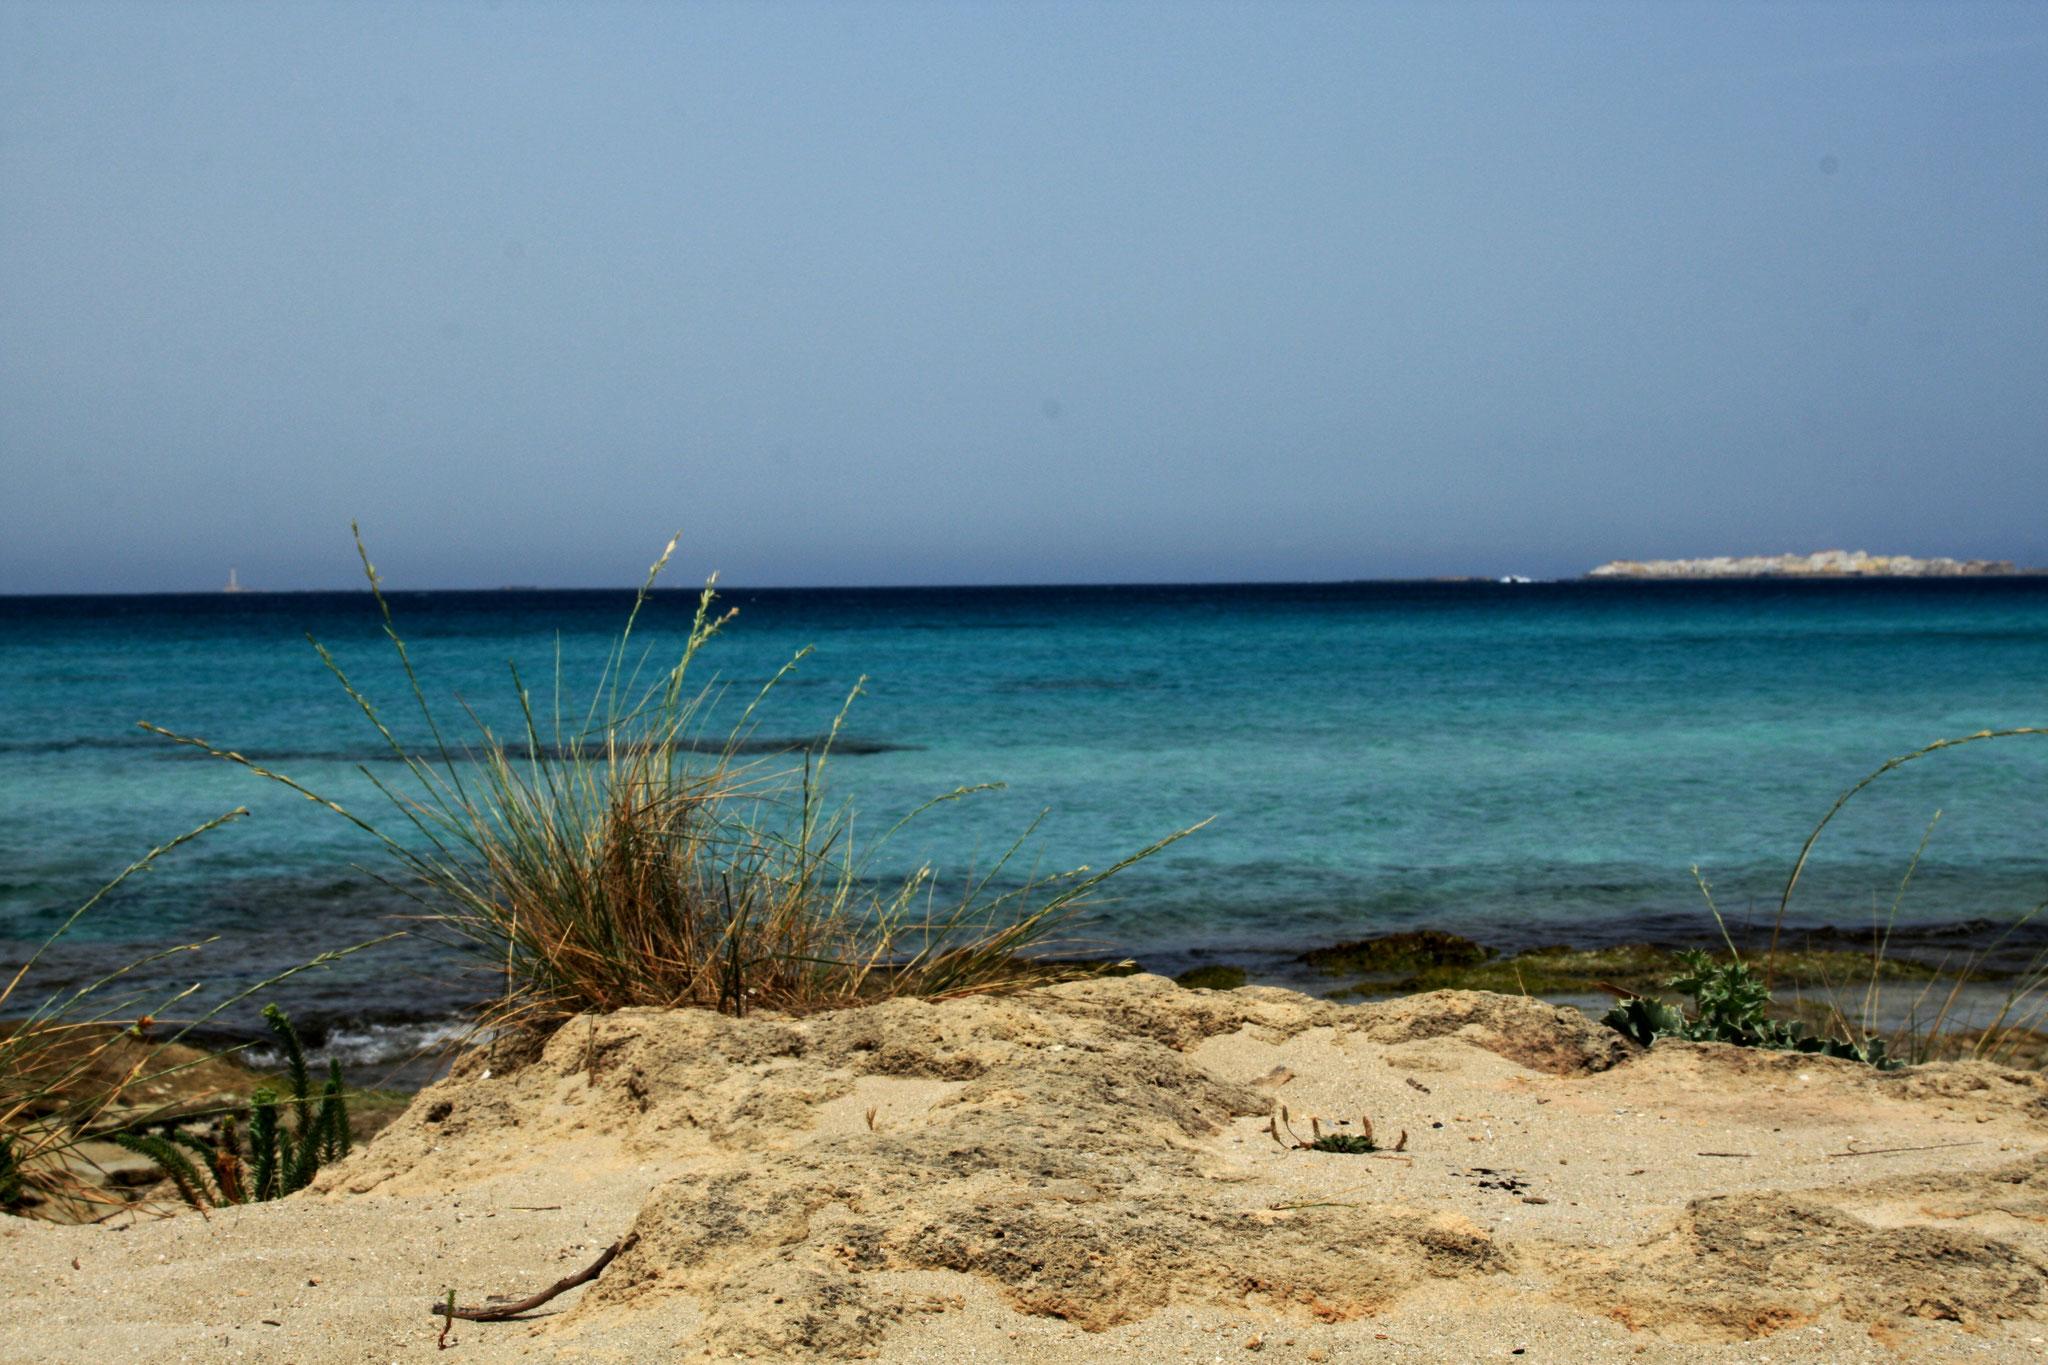 Apulien Karte Strände.Strand Küste Meer In Apulien Das Meer Und Apulien